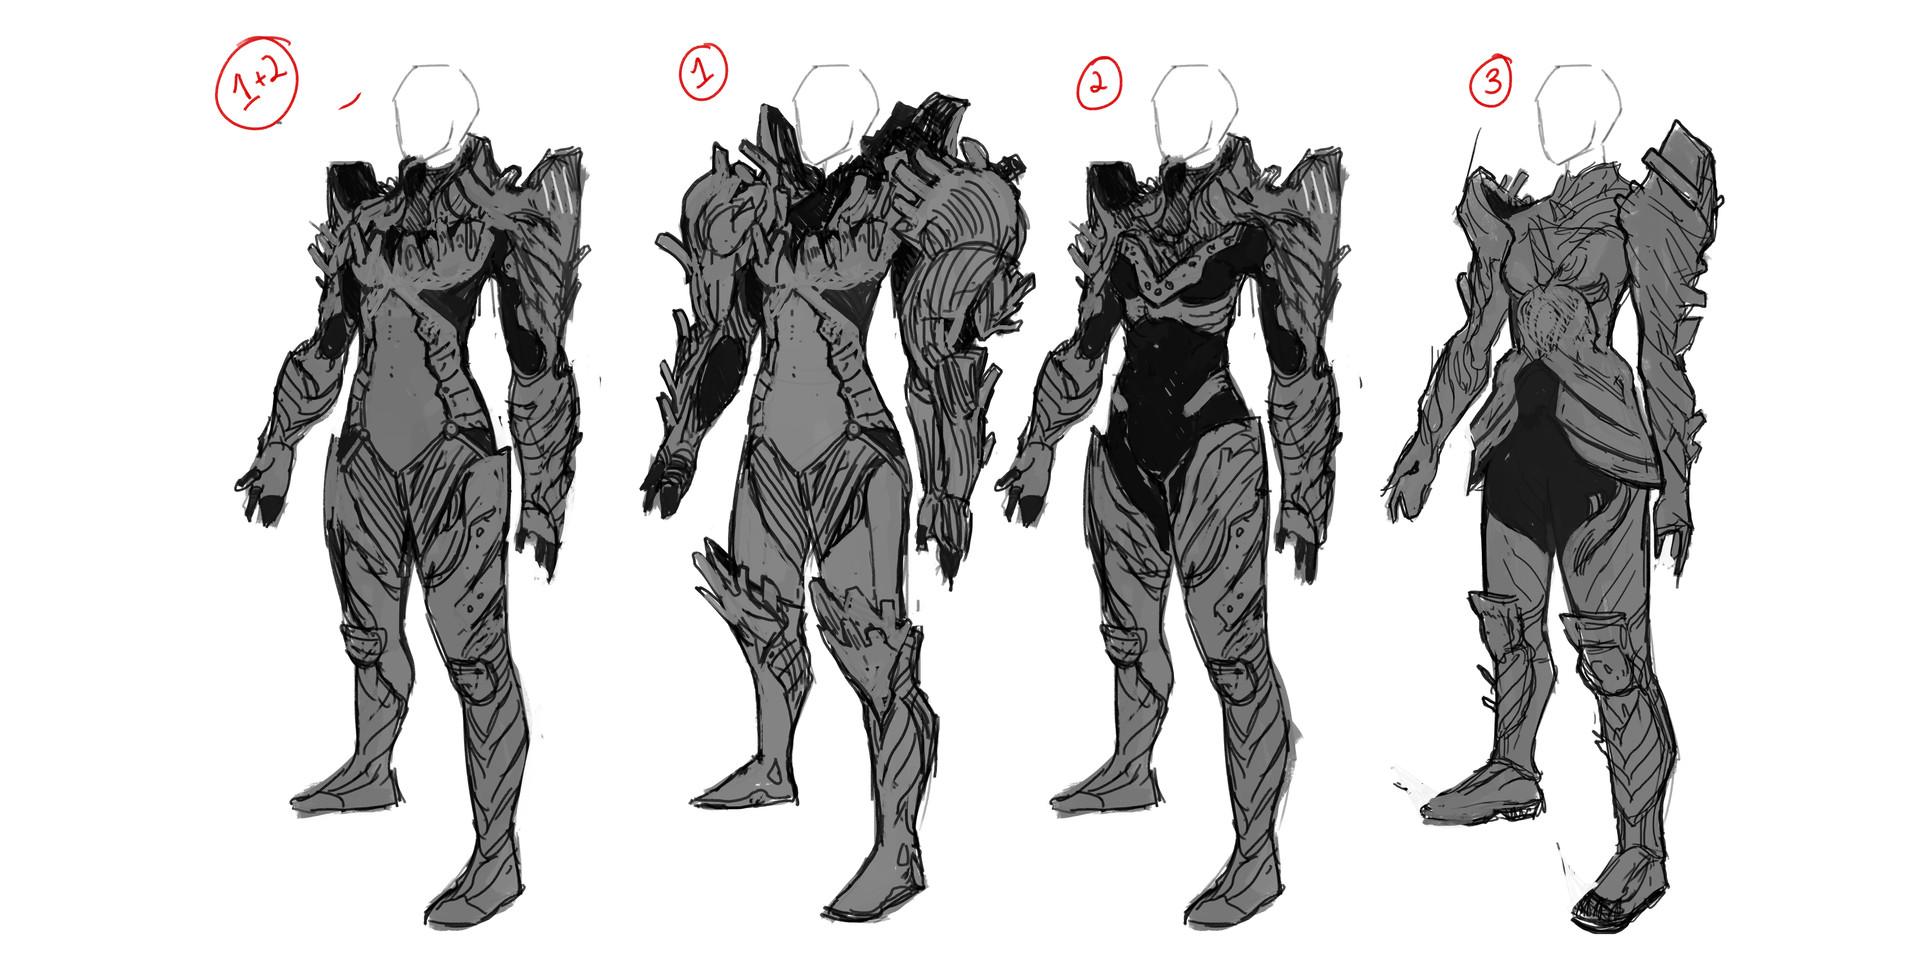 Stef tastan armor update2